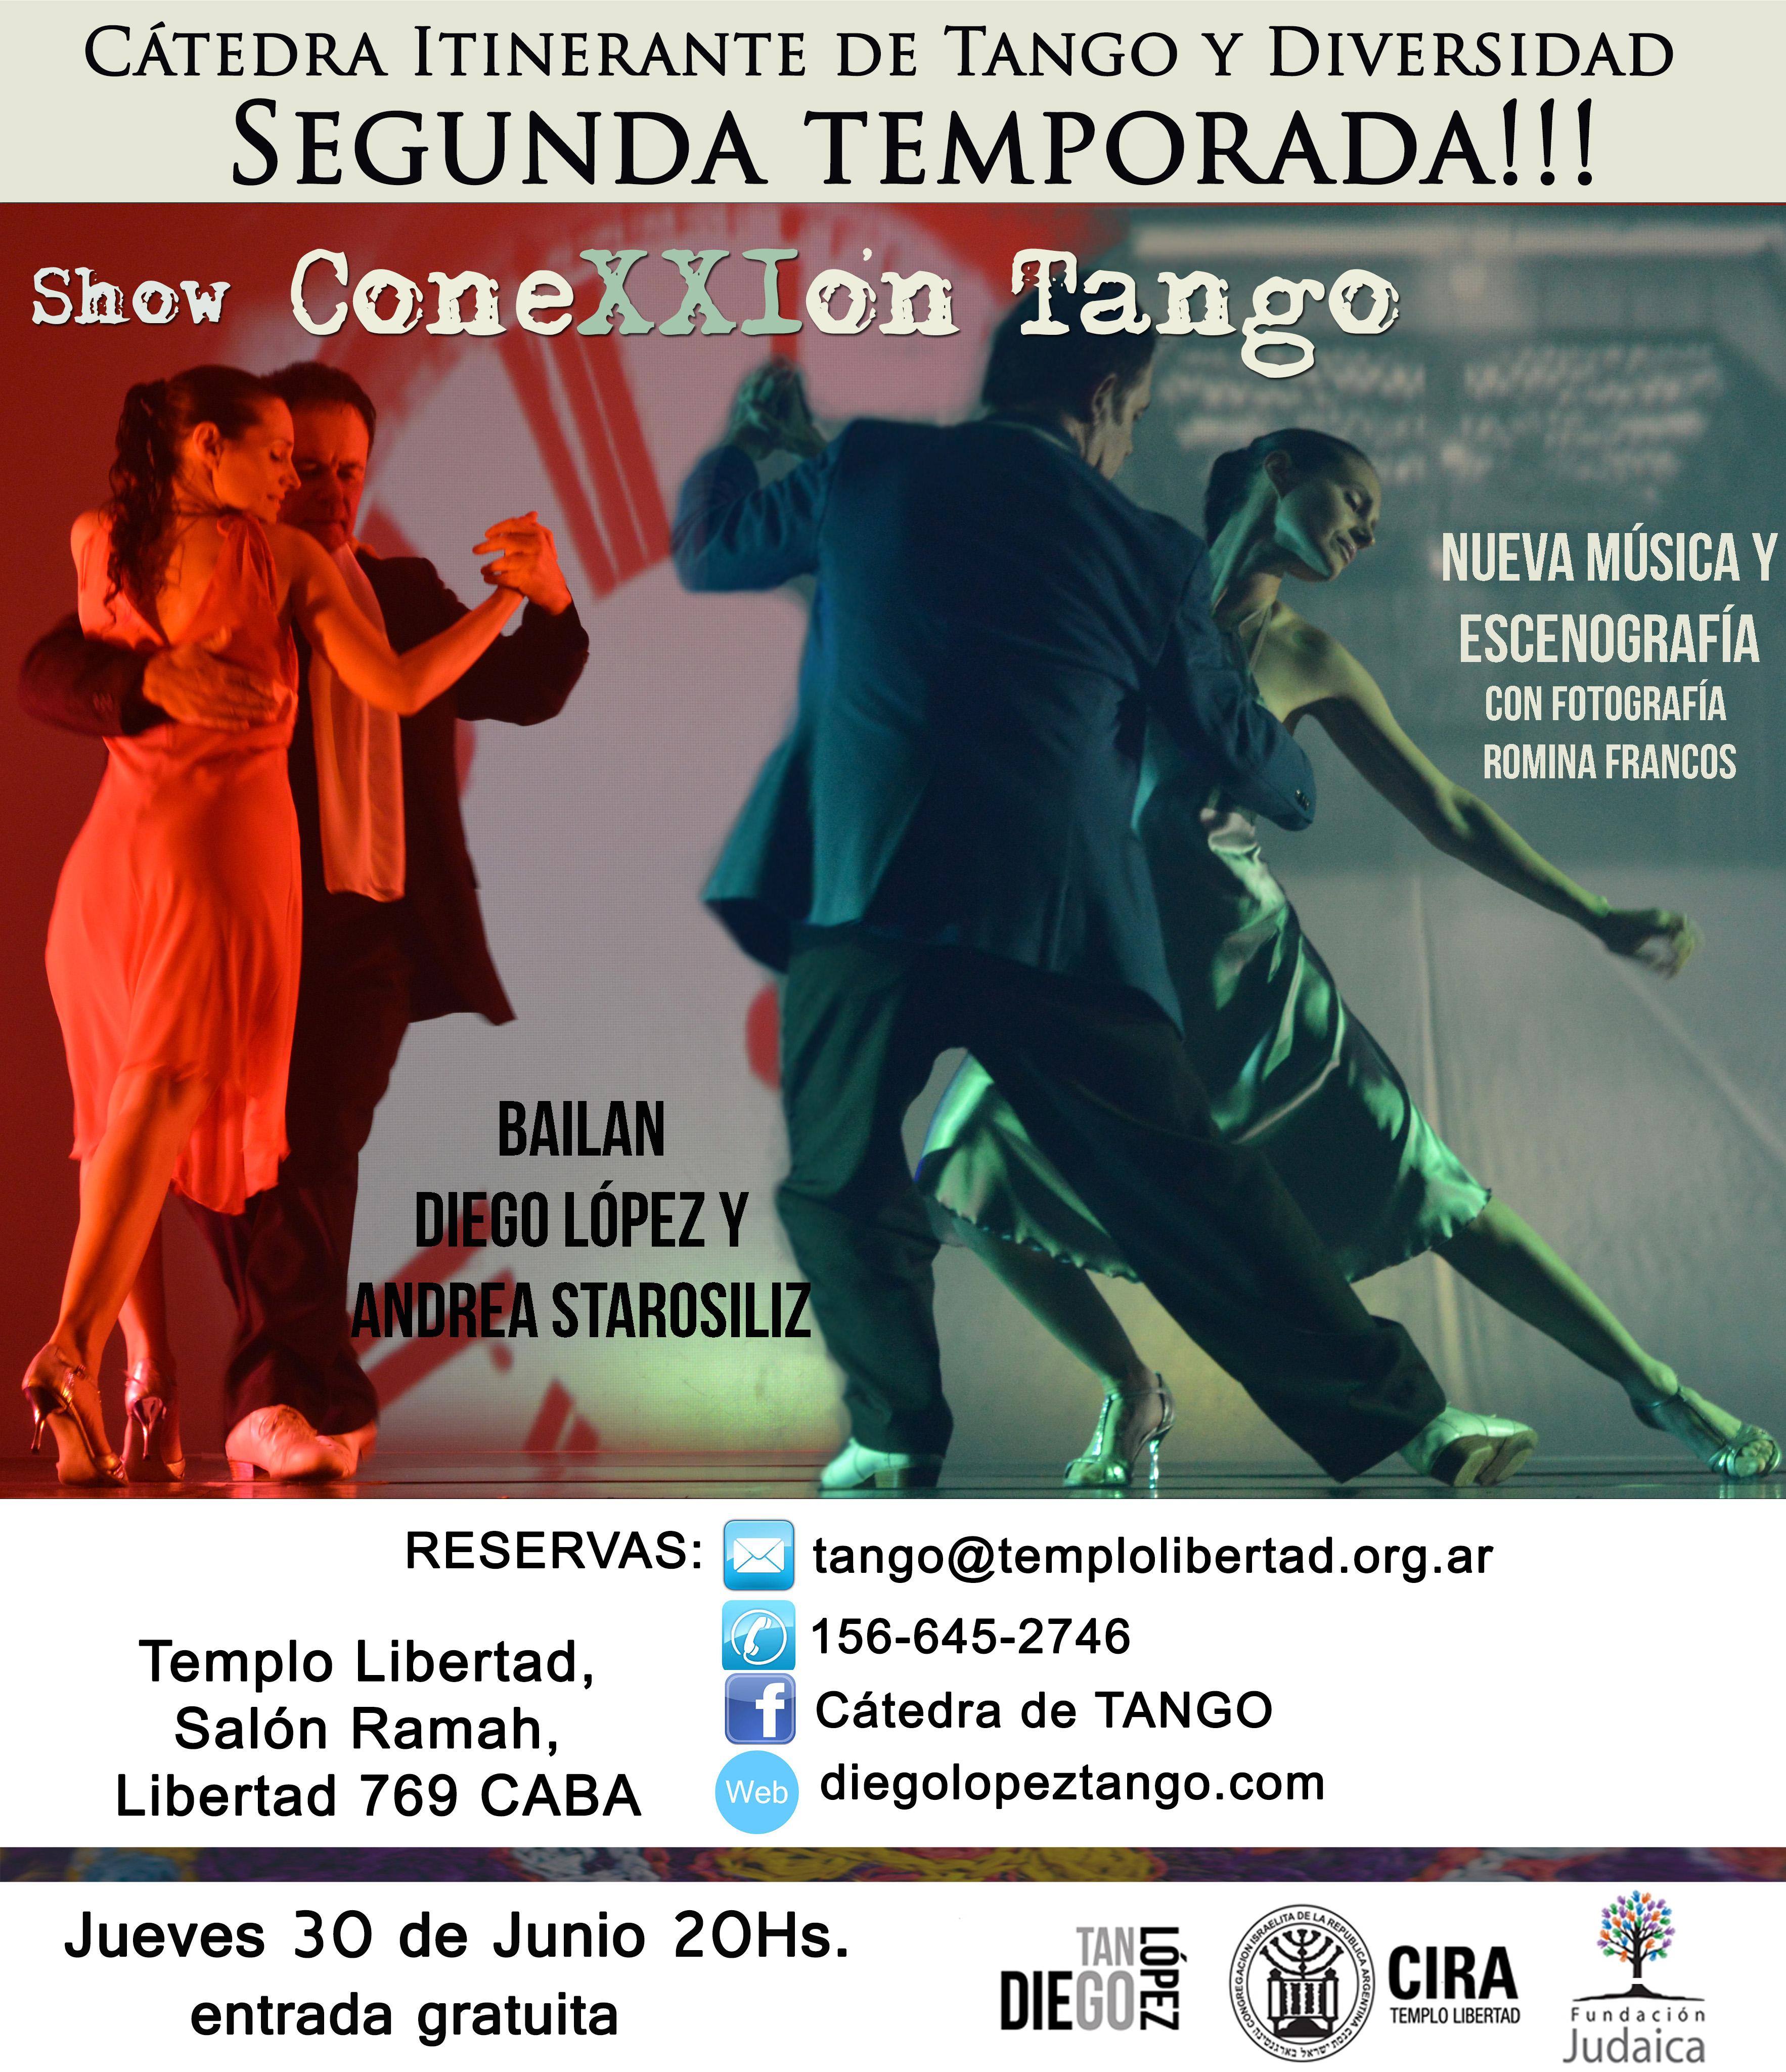 conexxion tango 30-6-2016